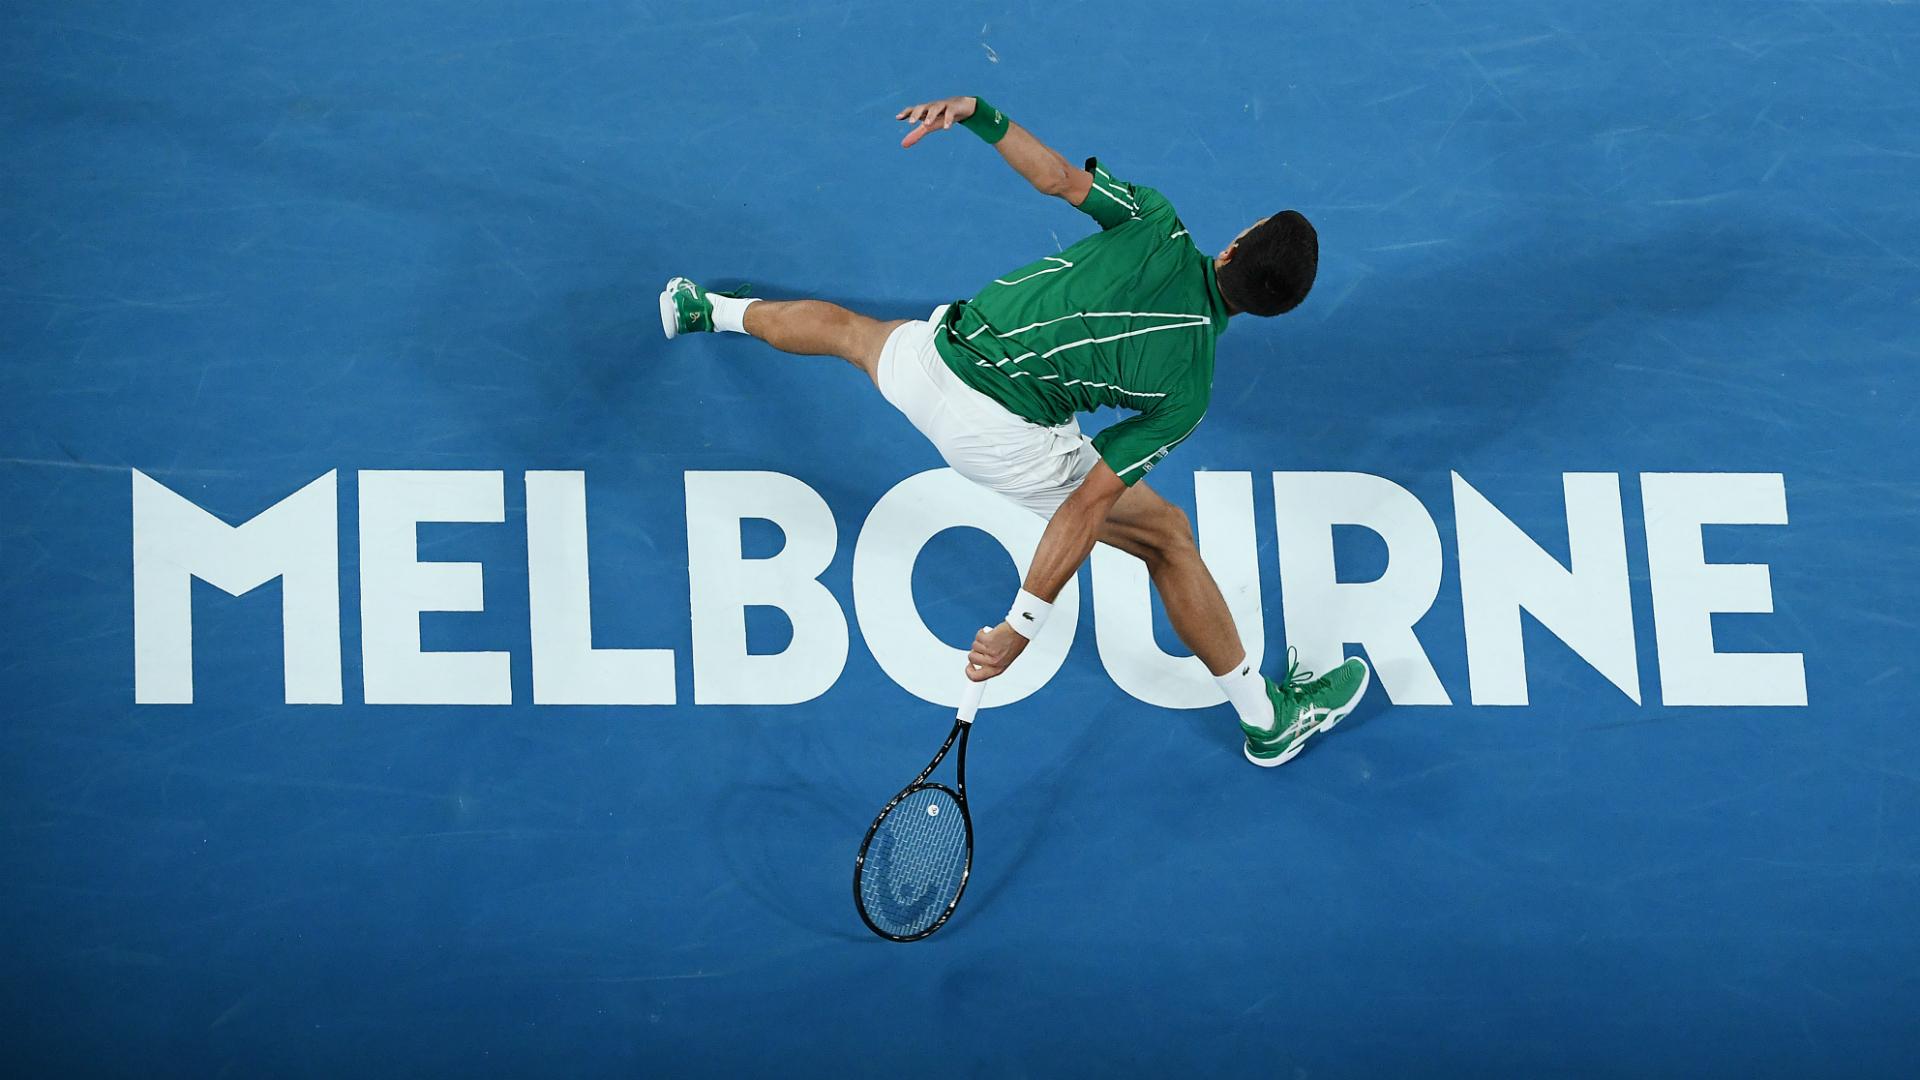 Australian Open 2021 Mandatory 14 Day Quarantine For Players Confirmed Sporting News